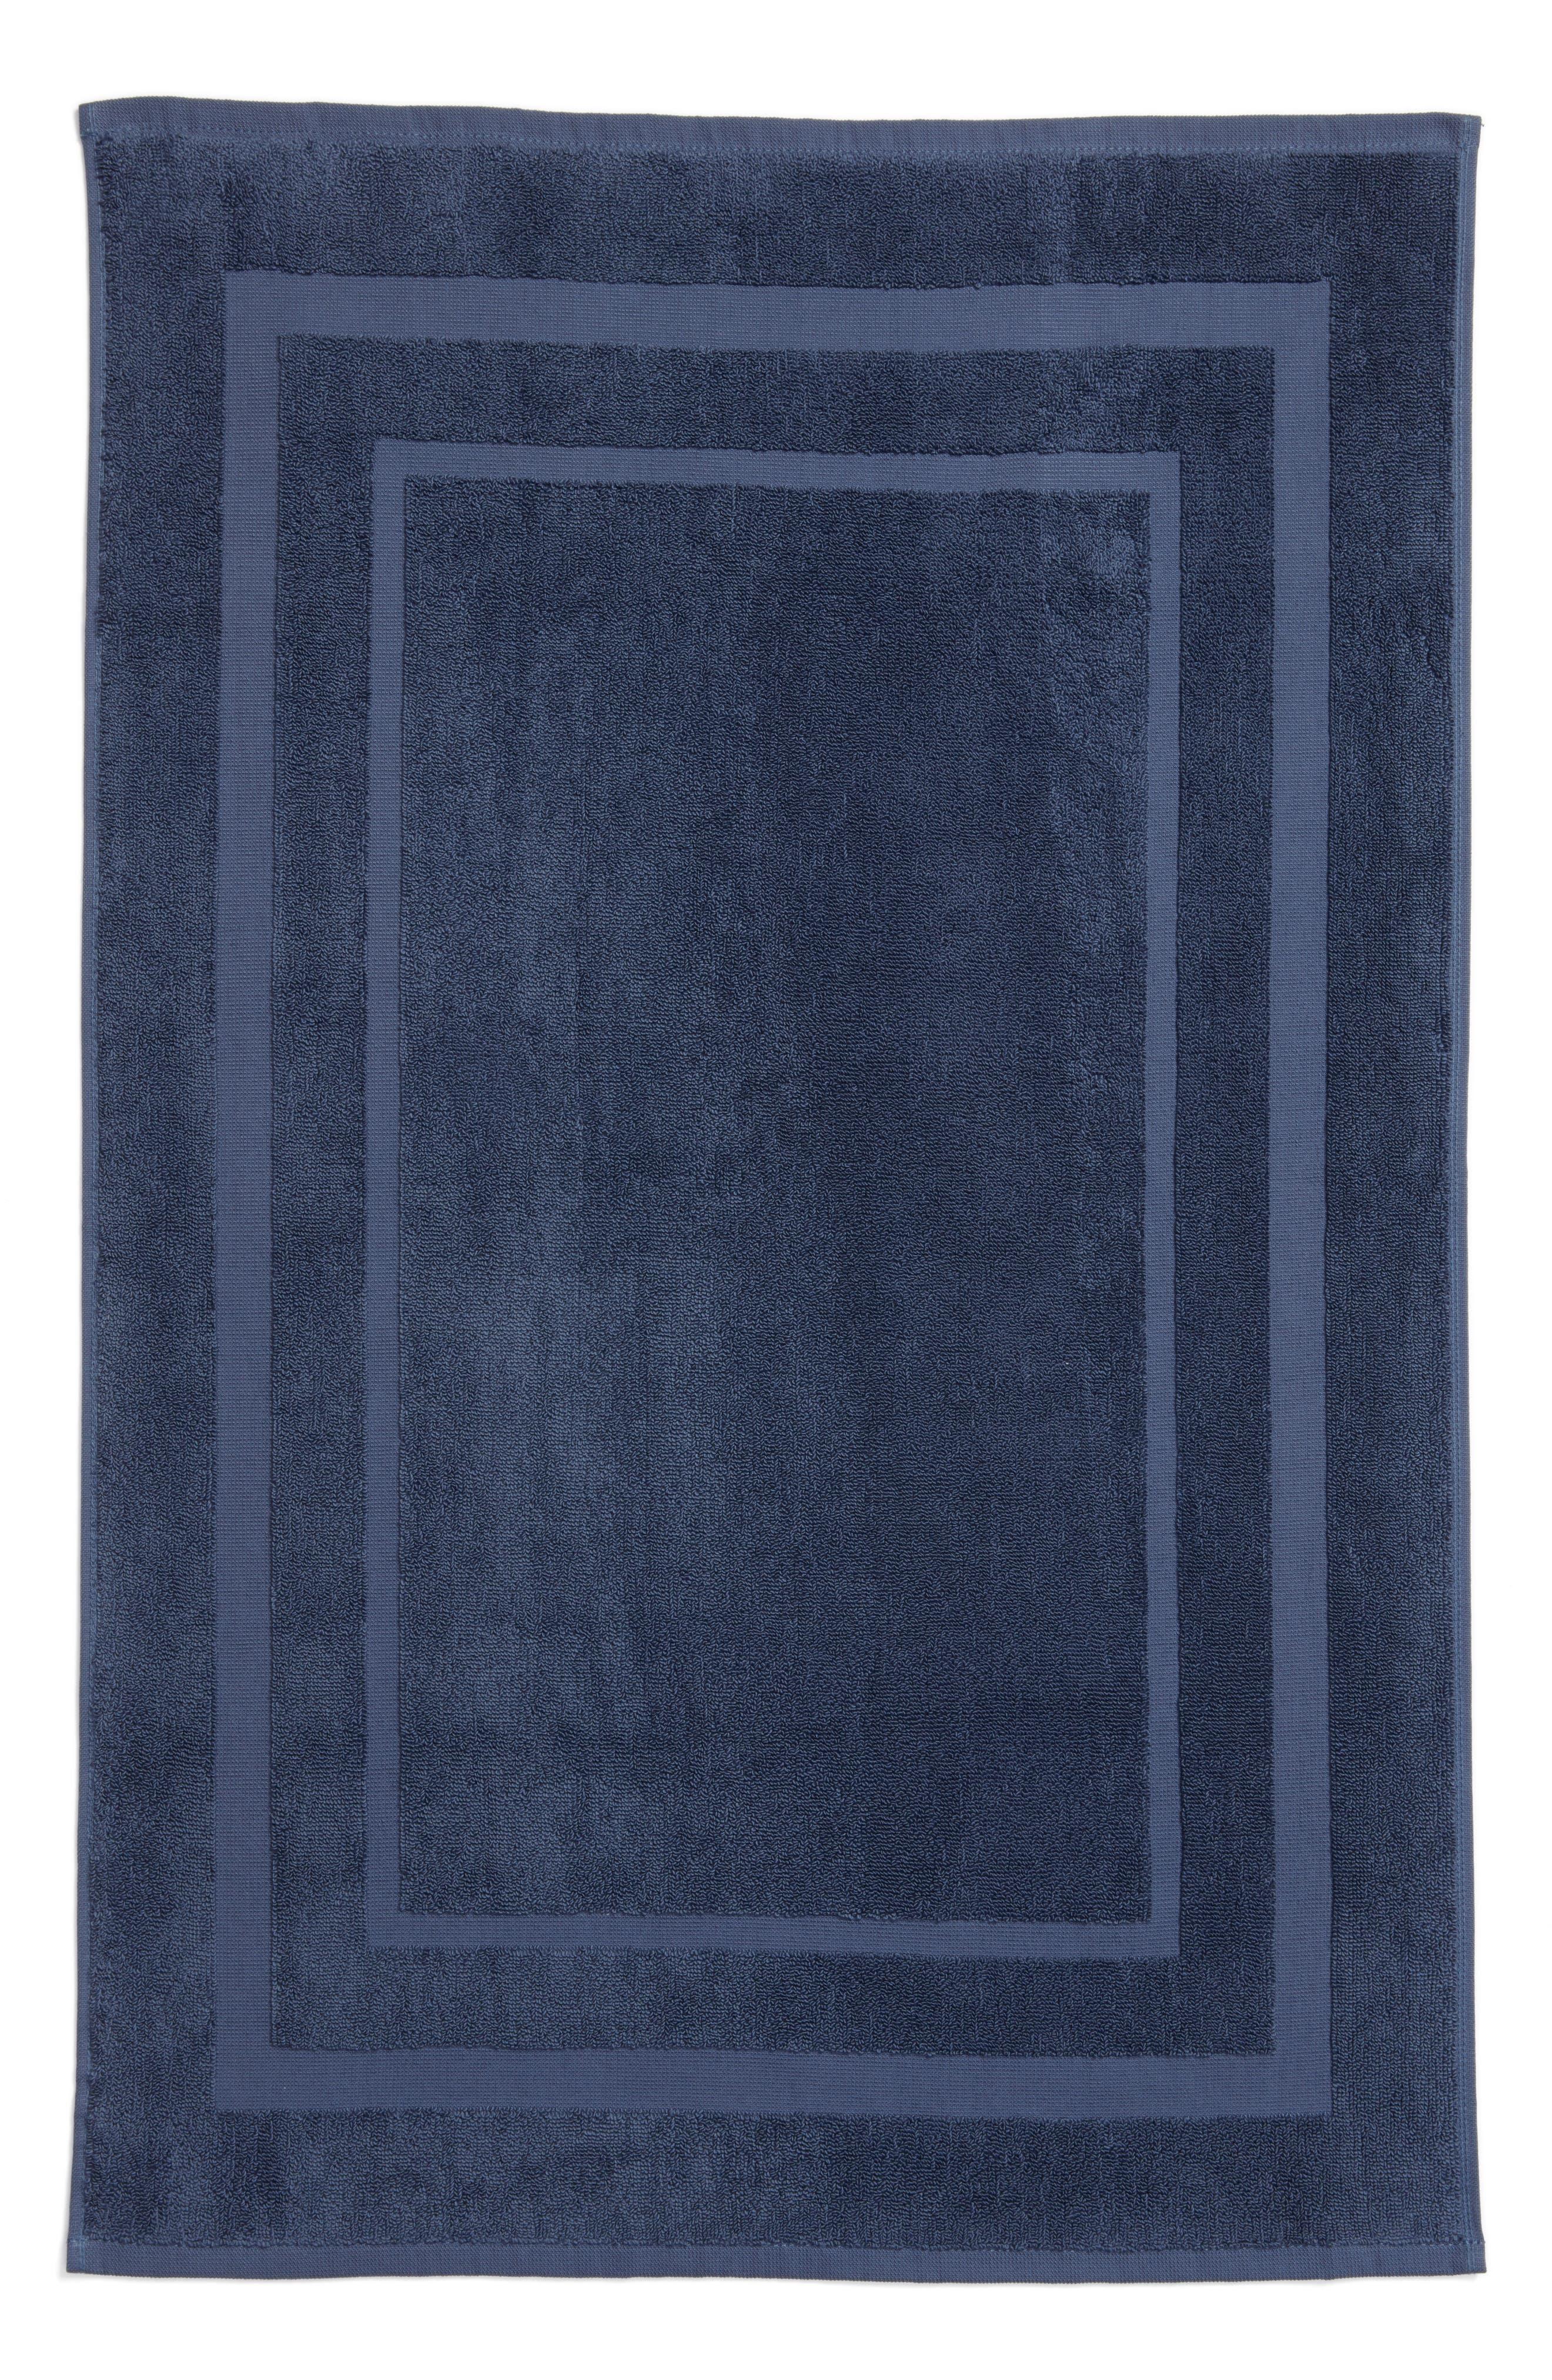 Studio 'Perennial' Turkish Cotton Bath Mat,                         Main,                         color, INDIGO BLUE